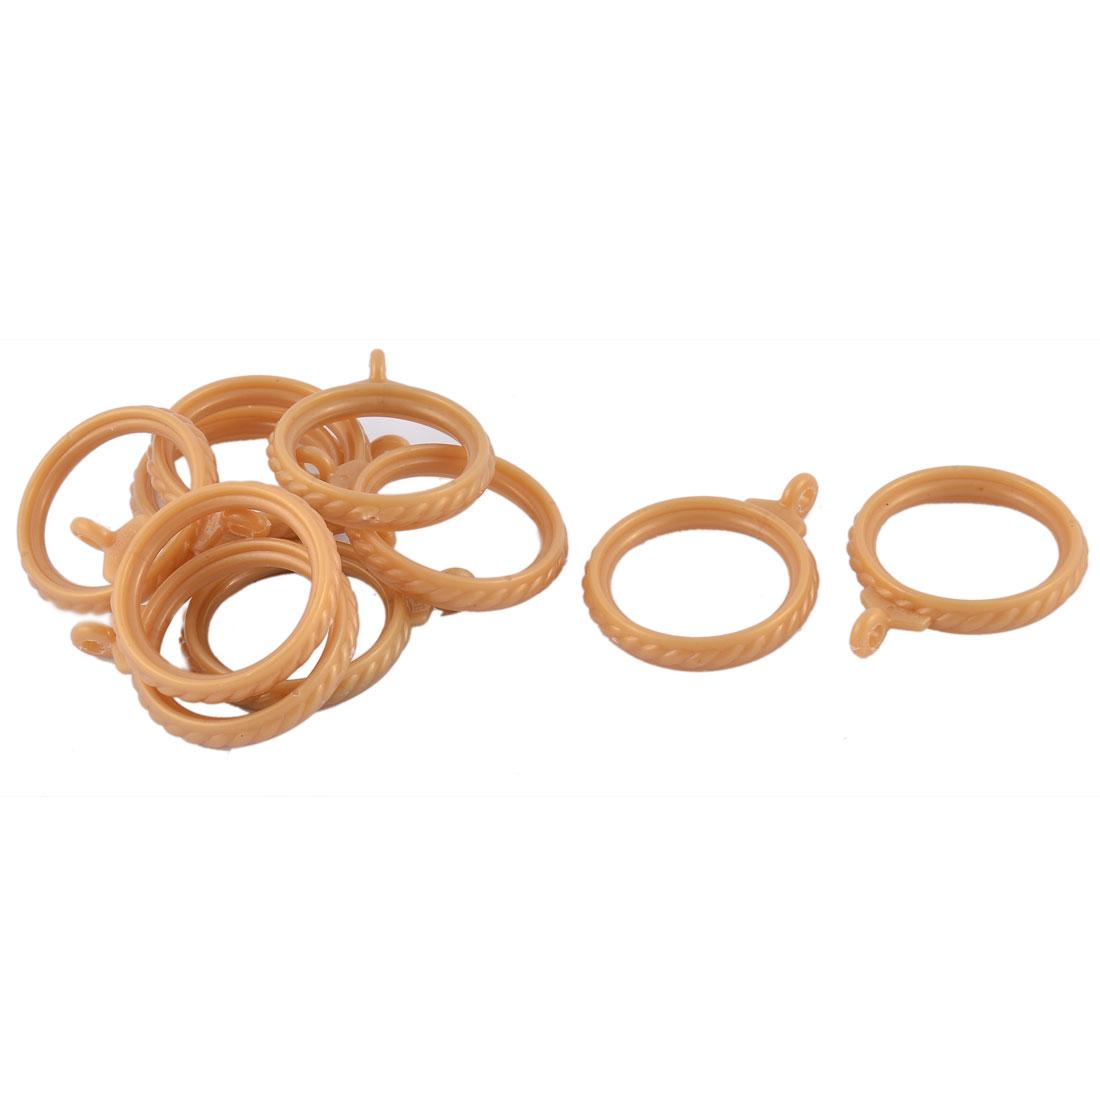 Bathroom Bedroom Plastic Embossed Shower Curtain Drapery Ring Hooks Golden Yellow 3.5cm Dia 10pcs